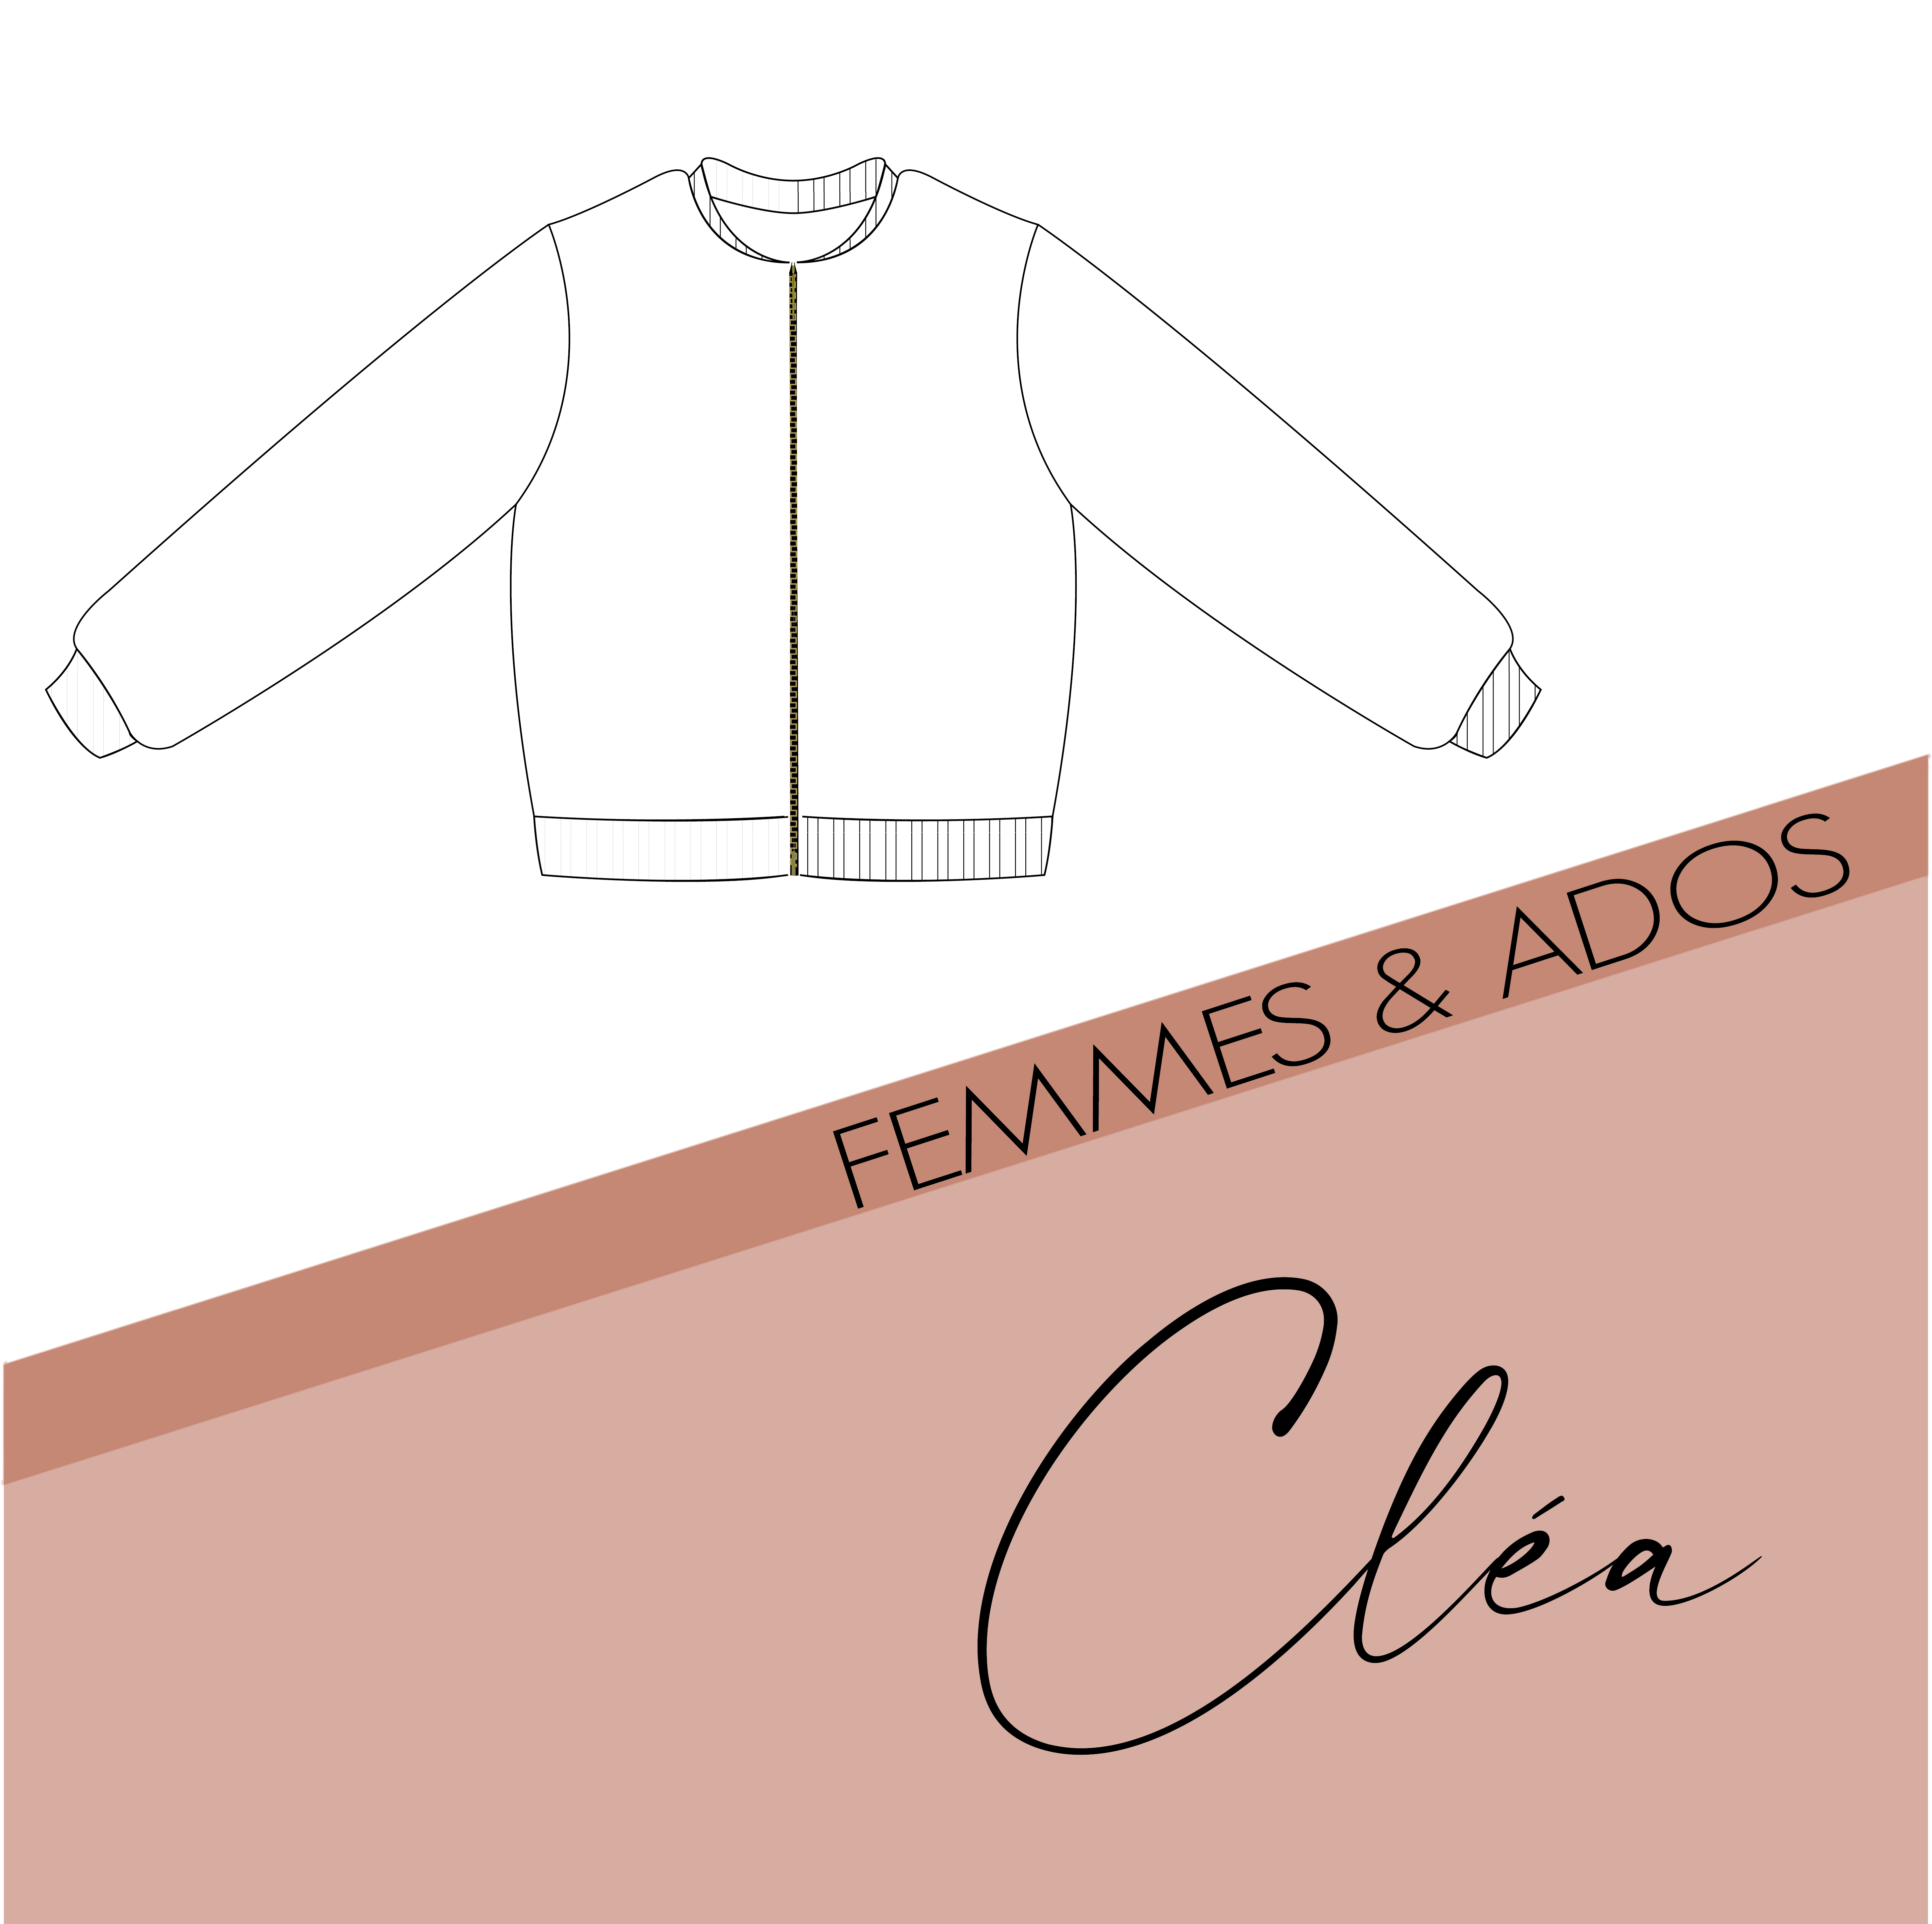 Cléa - femmes & ados